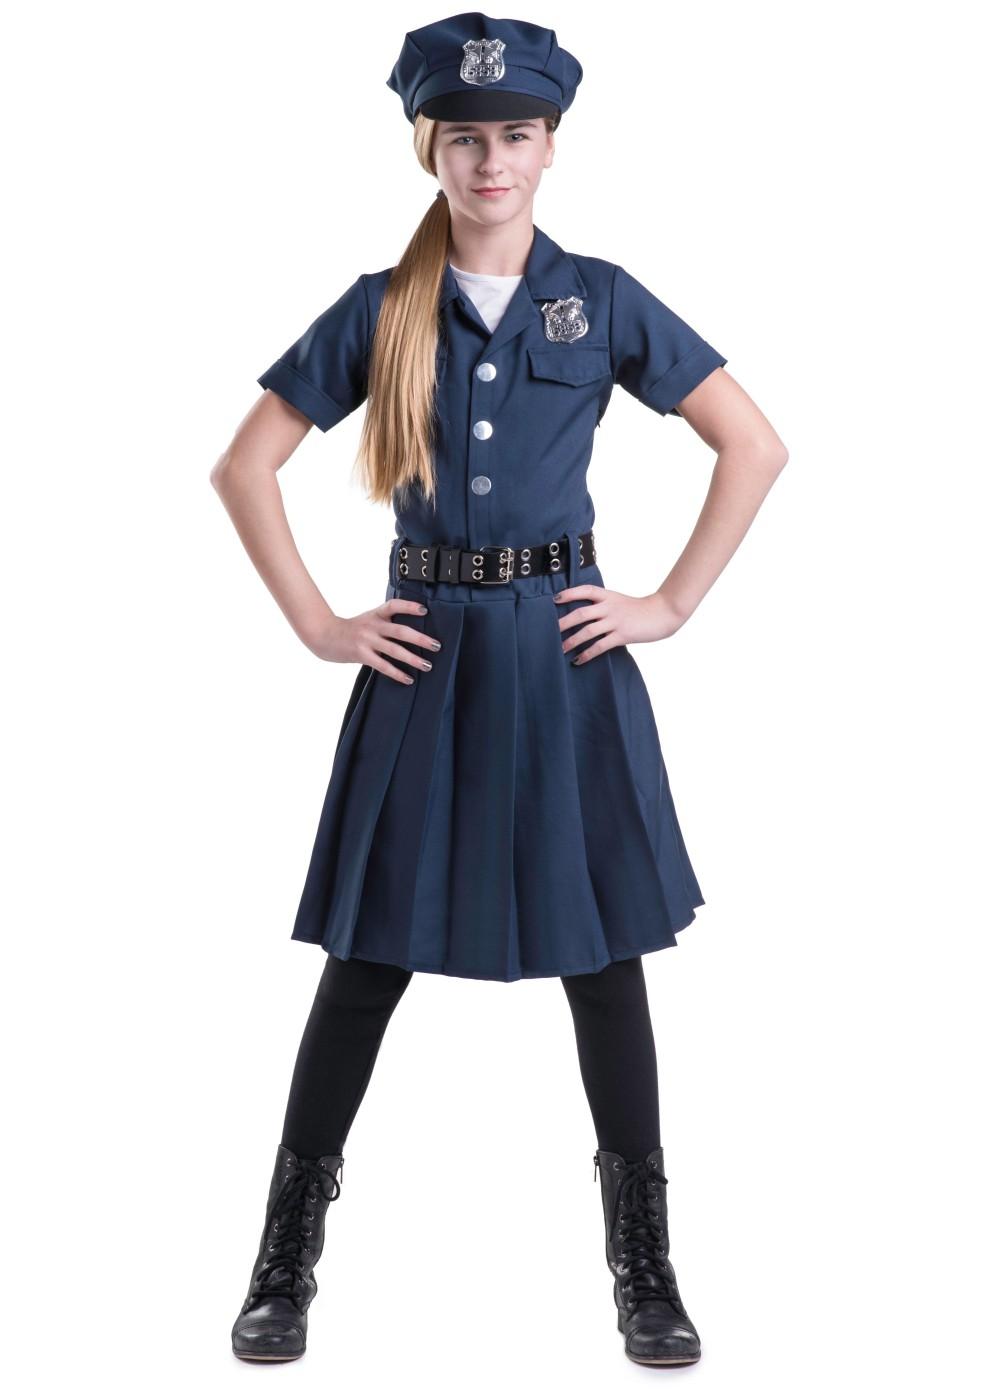 Police Girls Dress Costume - Professional Costumes